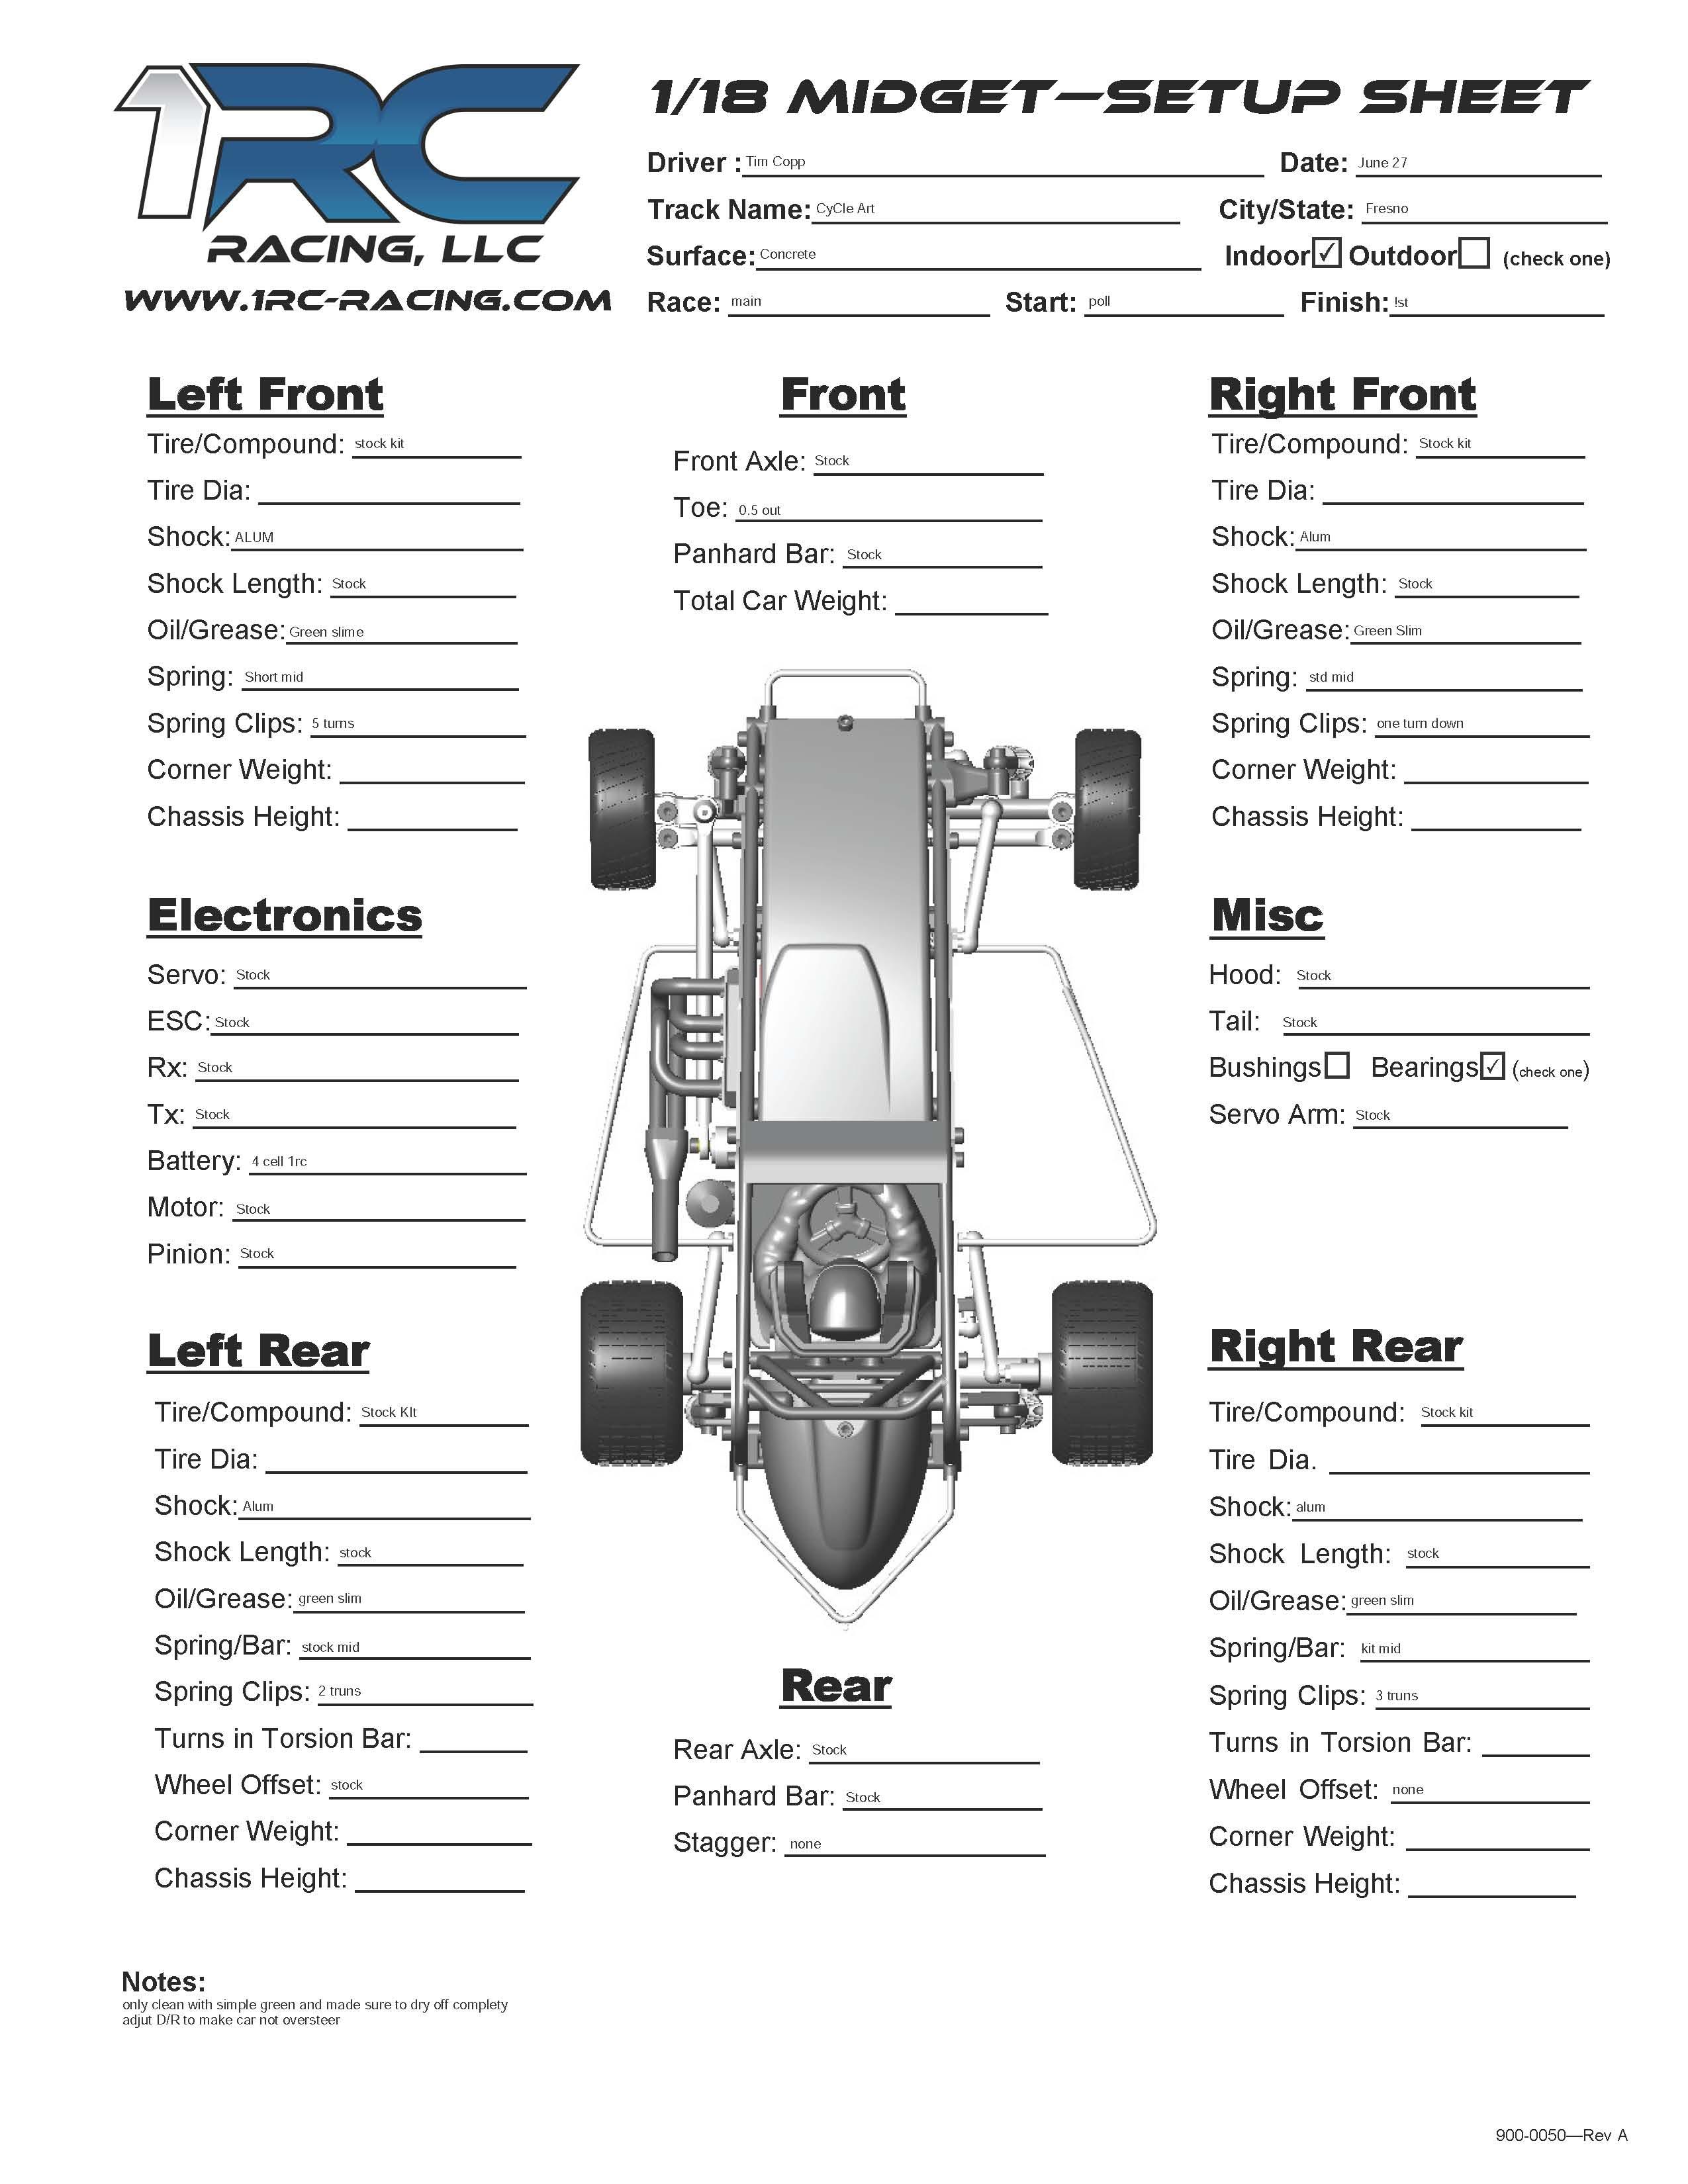 tim-copp-midget-set-up-cycle-art-racing.jpg